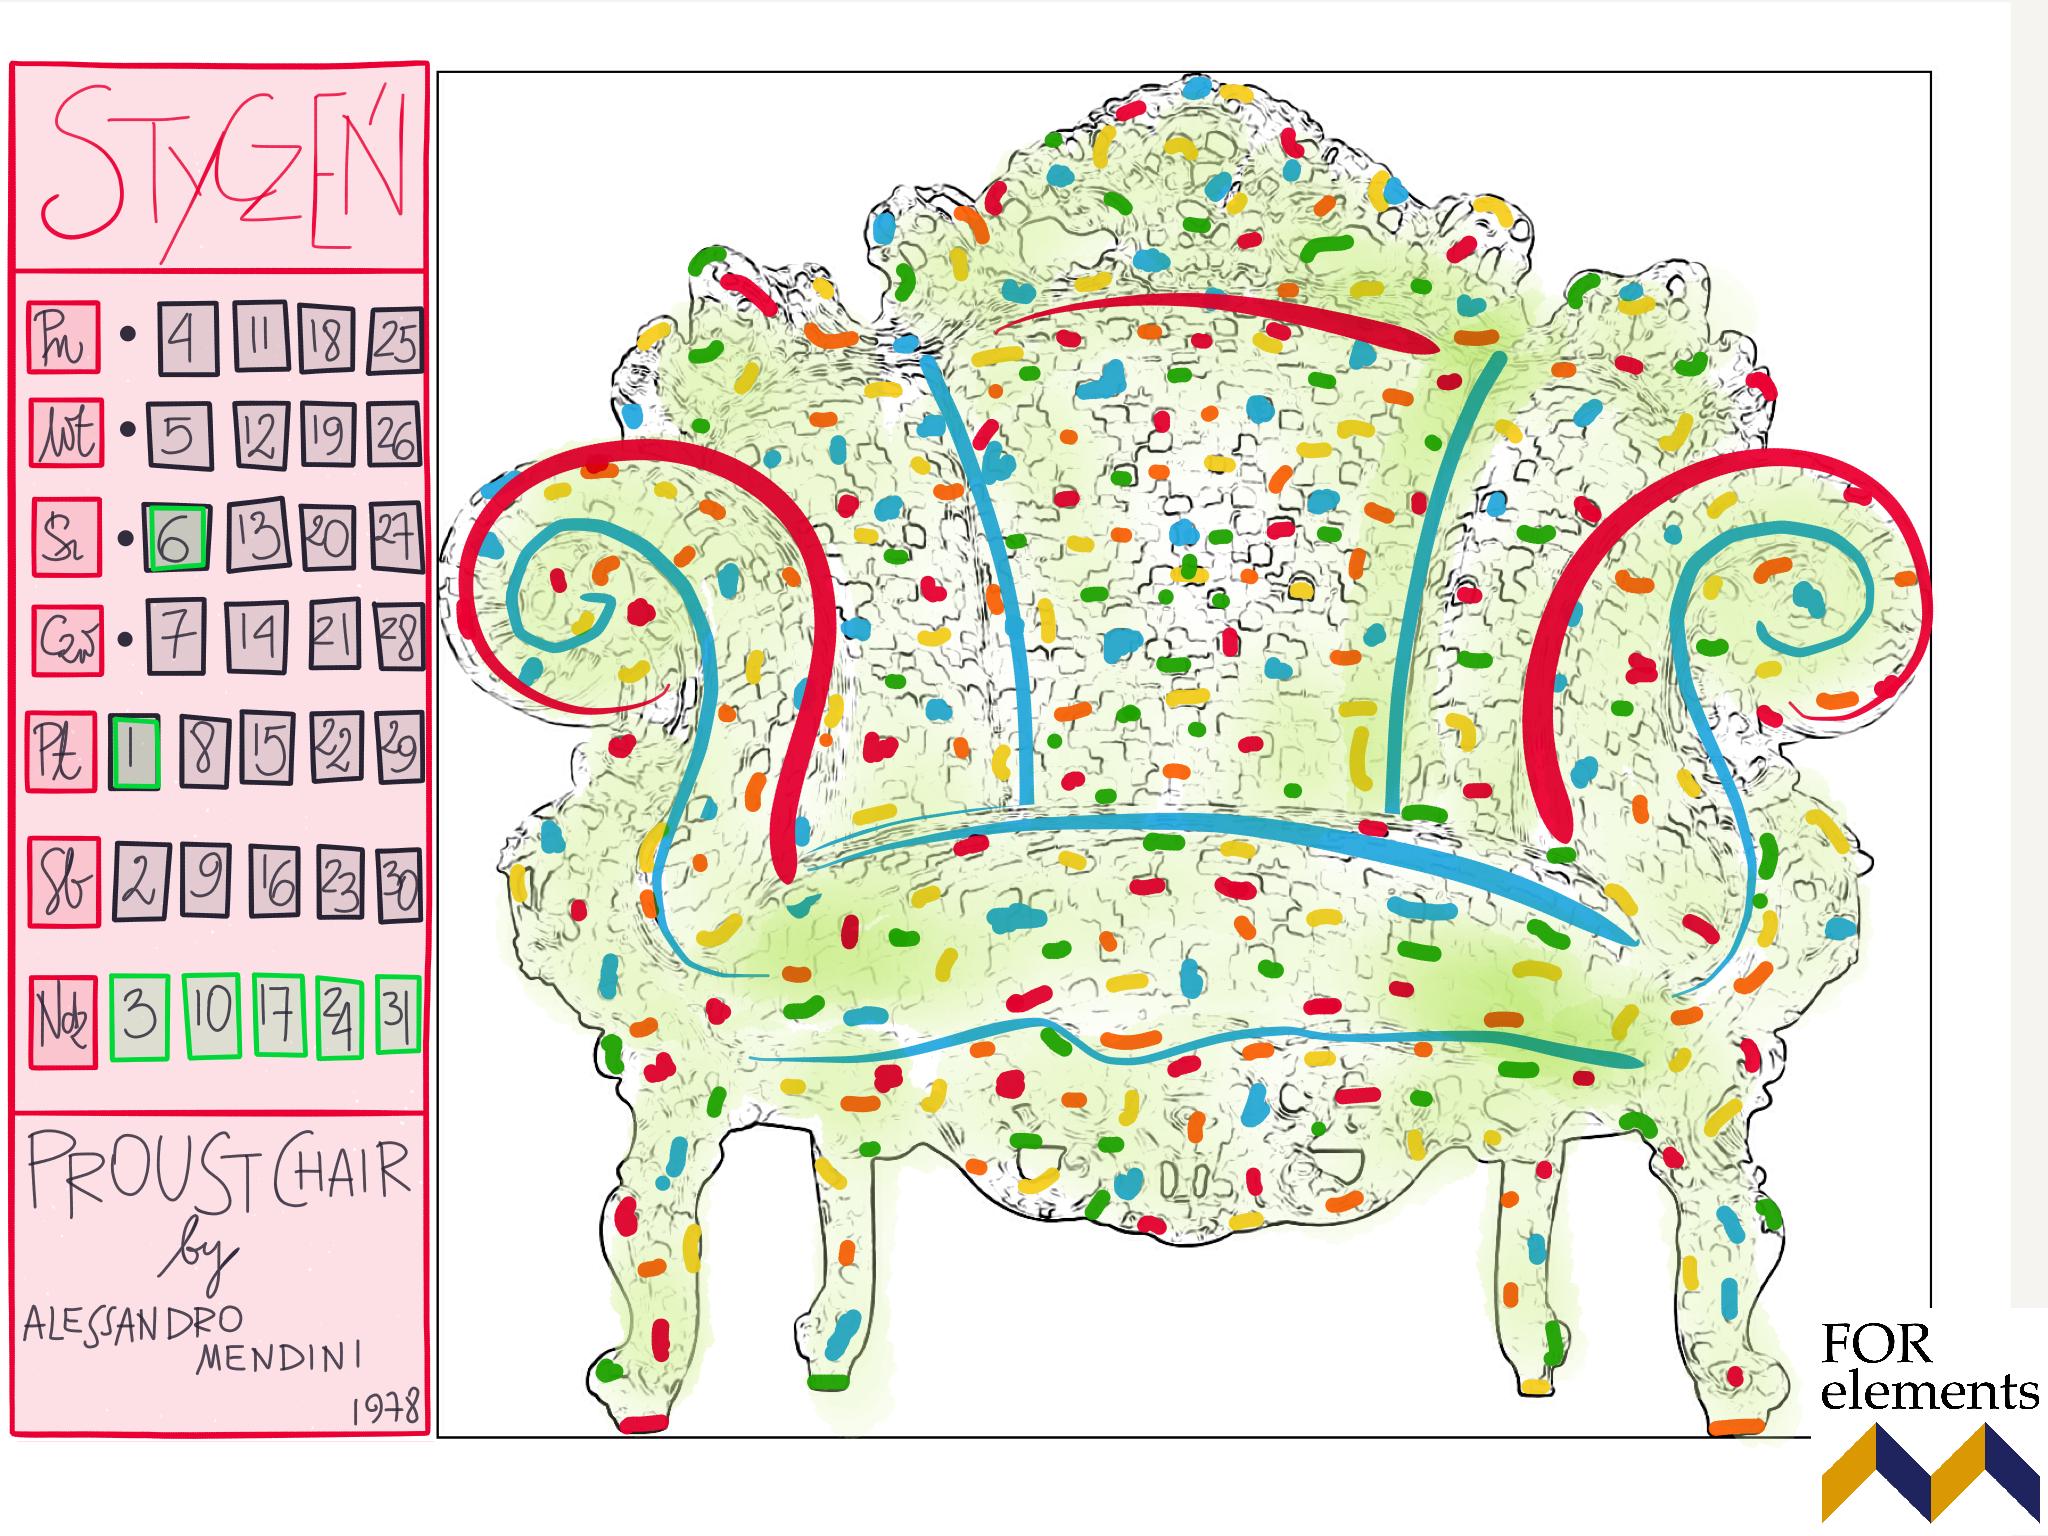 1 proust_chair_alessandro_mendini_cappellini_calendar_2016_design_icons_furniture_interior_ideas_home_decorationg_forelements_blog